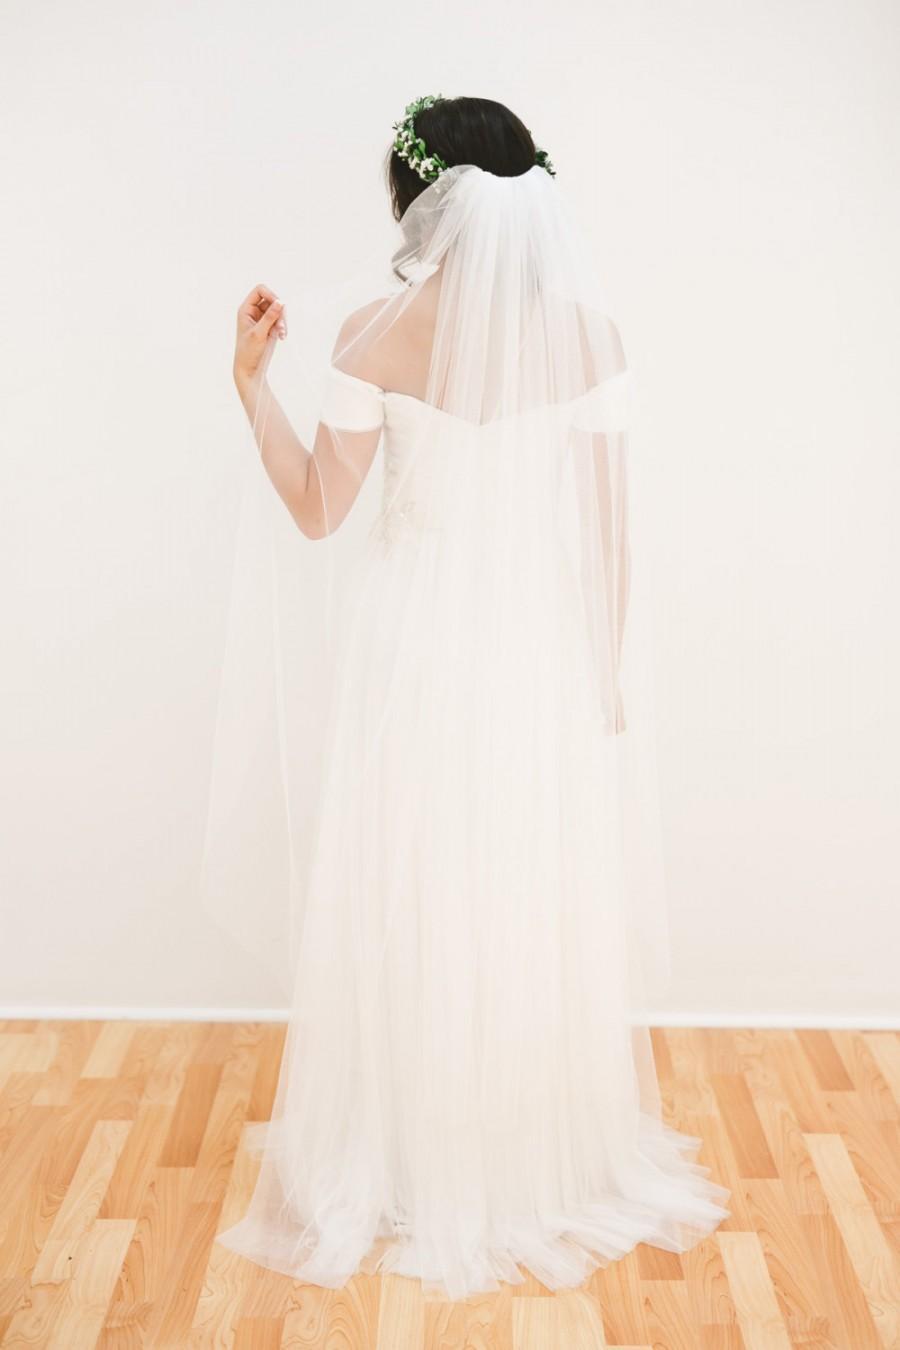 Wedding - wedding veil, english net veil, bridal veil, bohemian veil, long veil, chapel veil, cathedral veil, waltz veil, fingertip veil - ANNABELLE